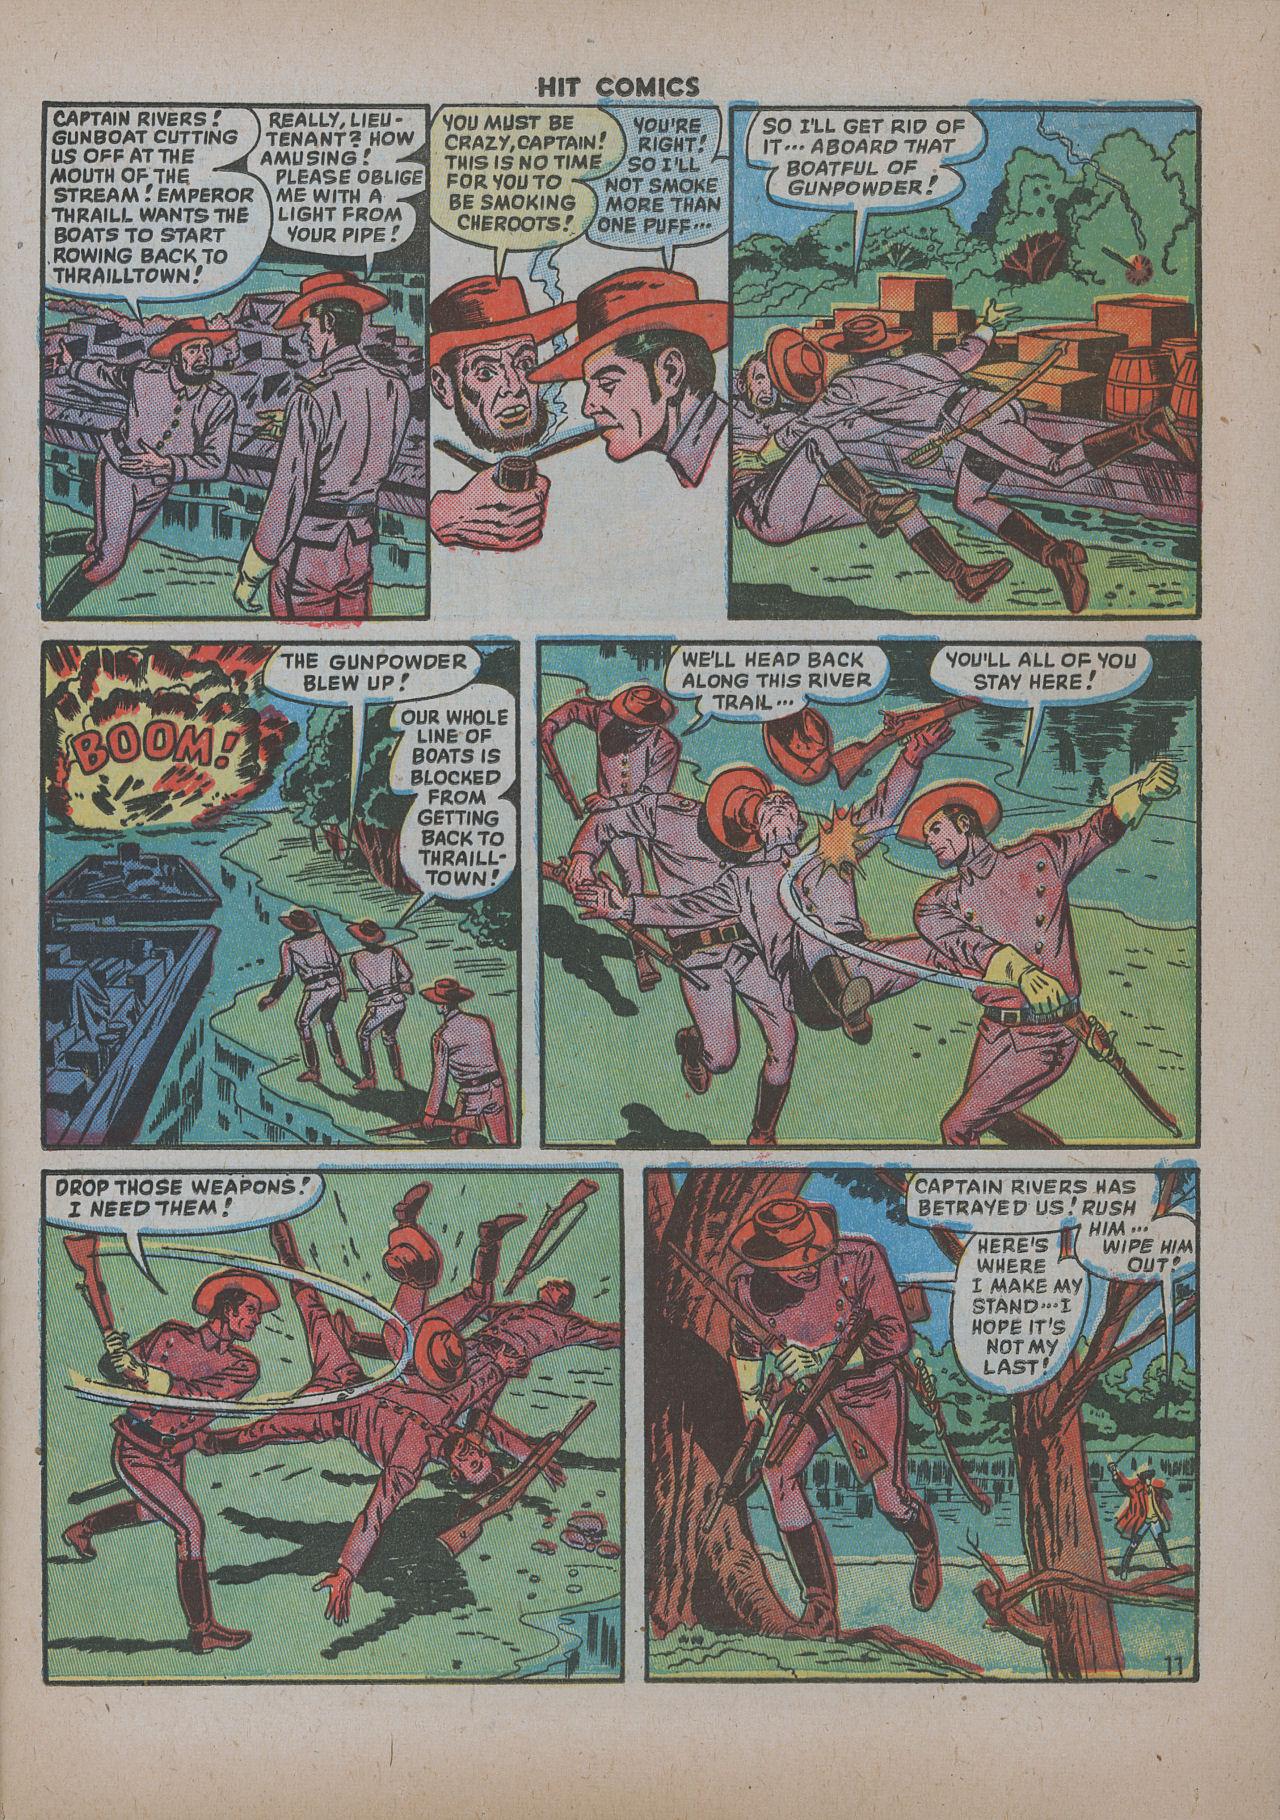 Read online Hit Comics comic -  Issue #62 - 14